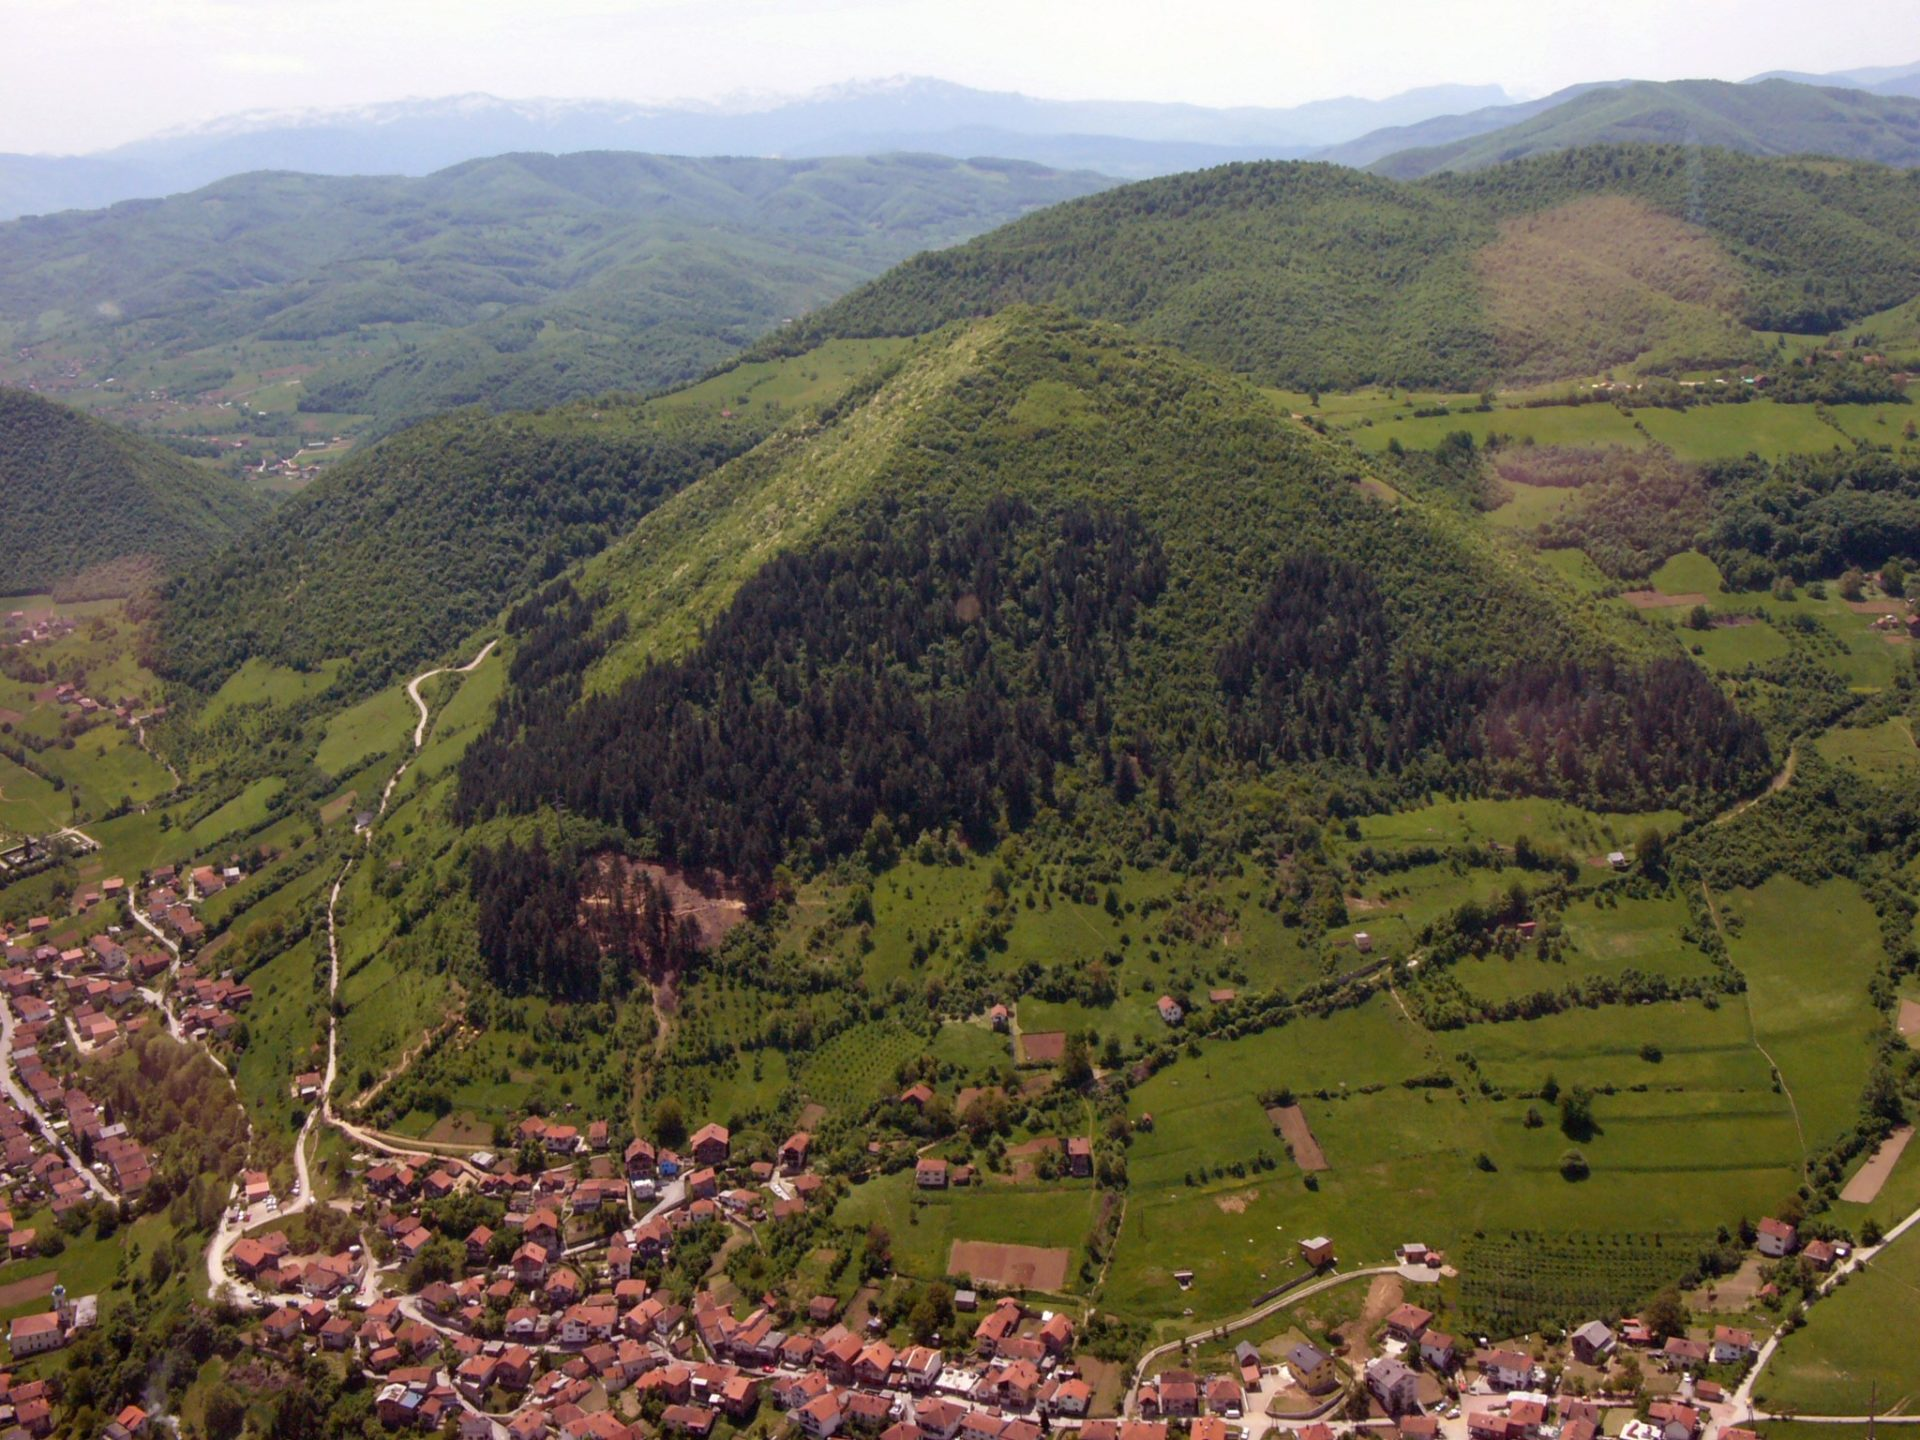 Semir Osmanagić: Zdravilna energija bosanskih piramid